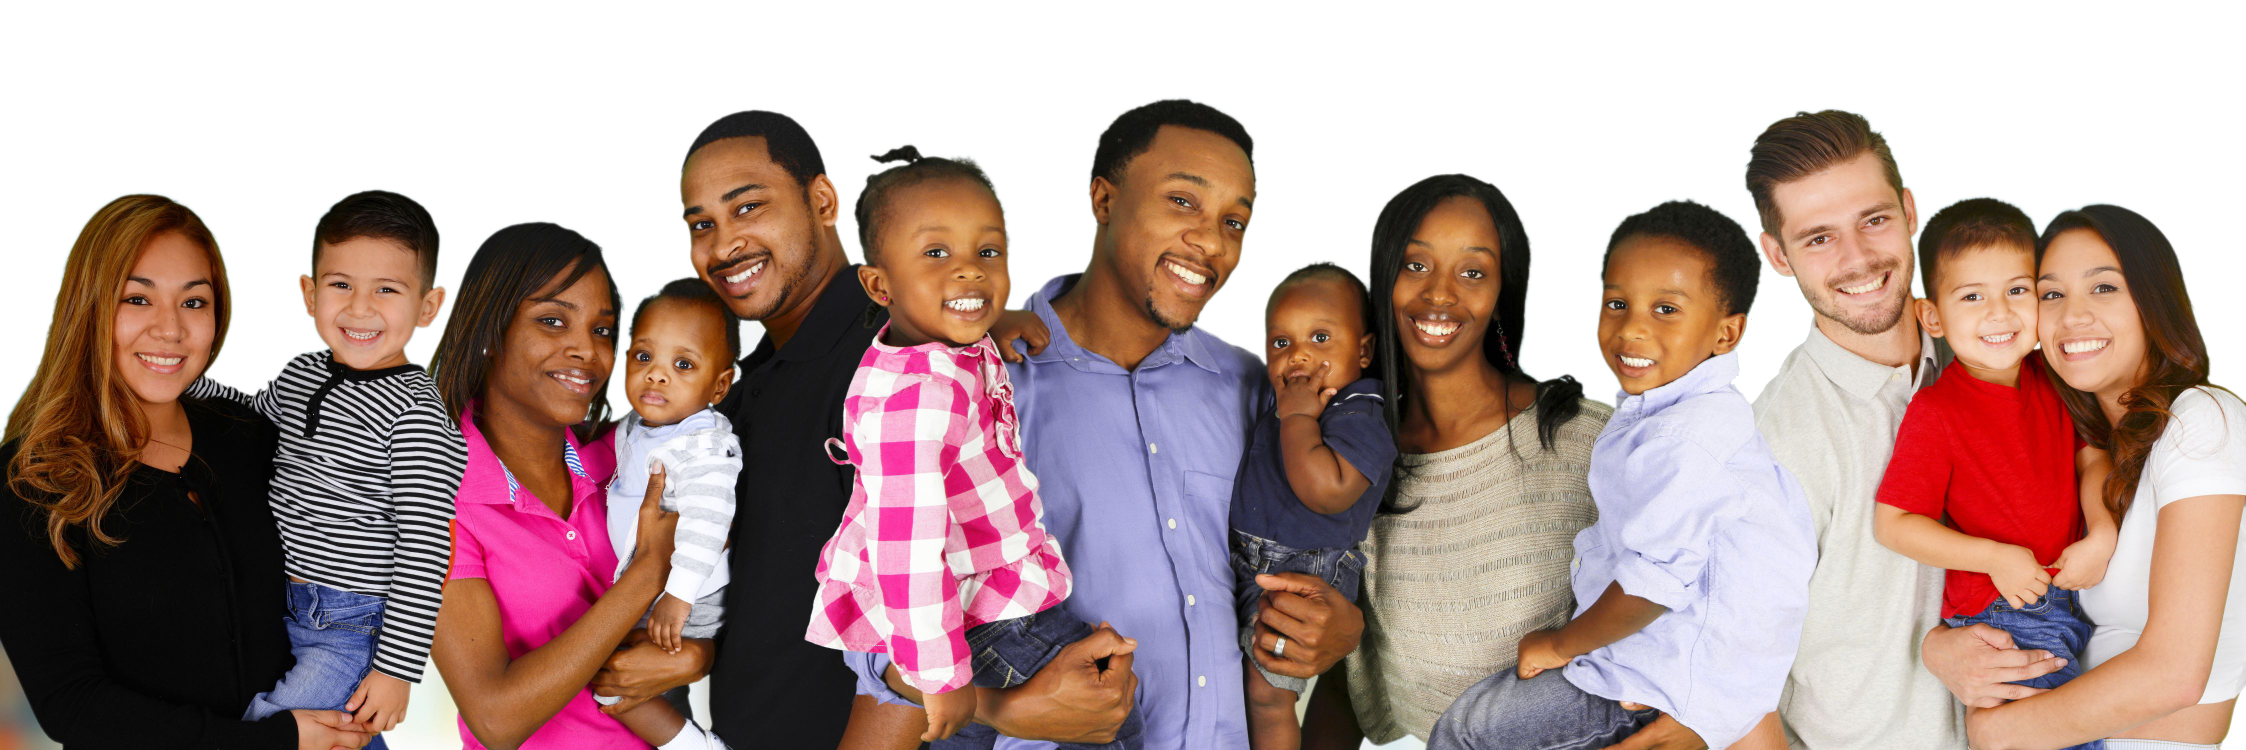 Birmingham Foundation Community Focused Foundation in Pittsburgh